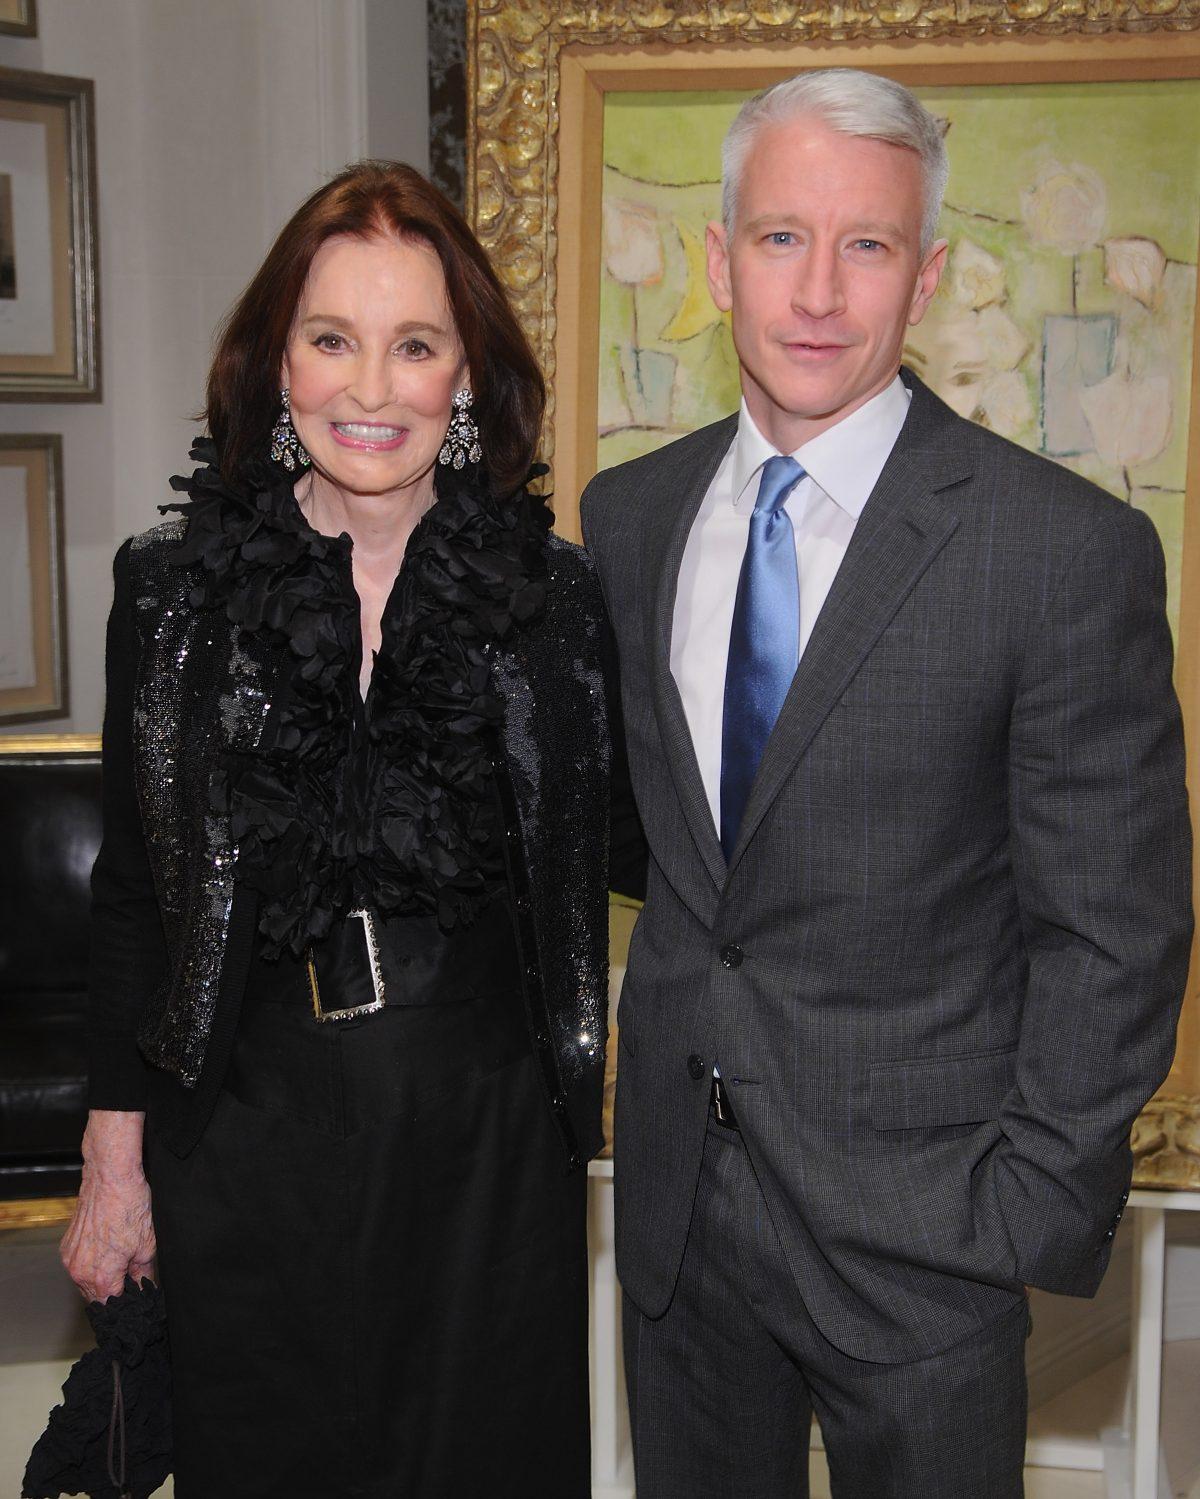 Gloria-Vanderbilt-and-Anderson-Cooper